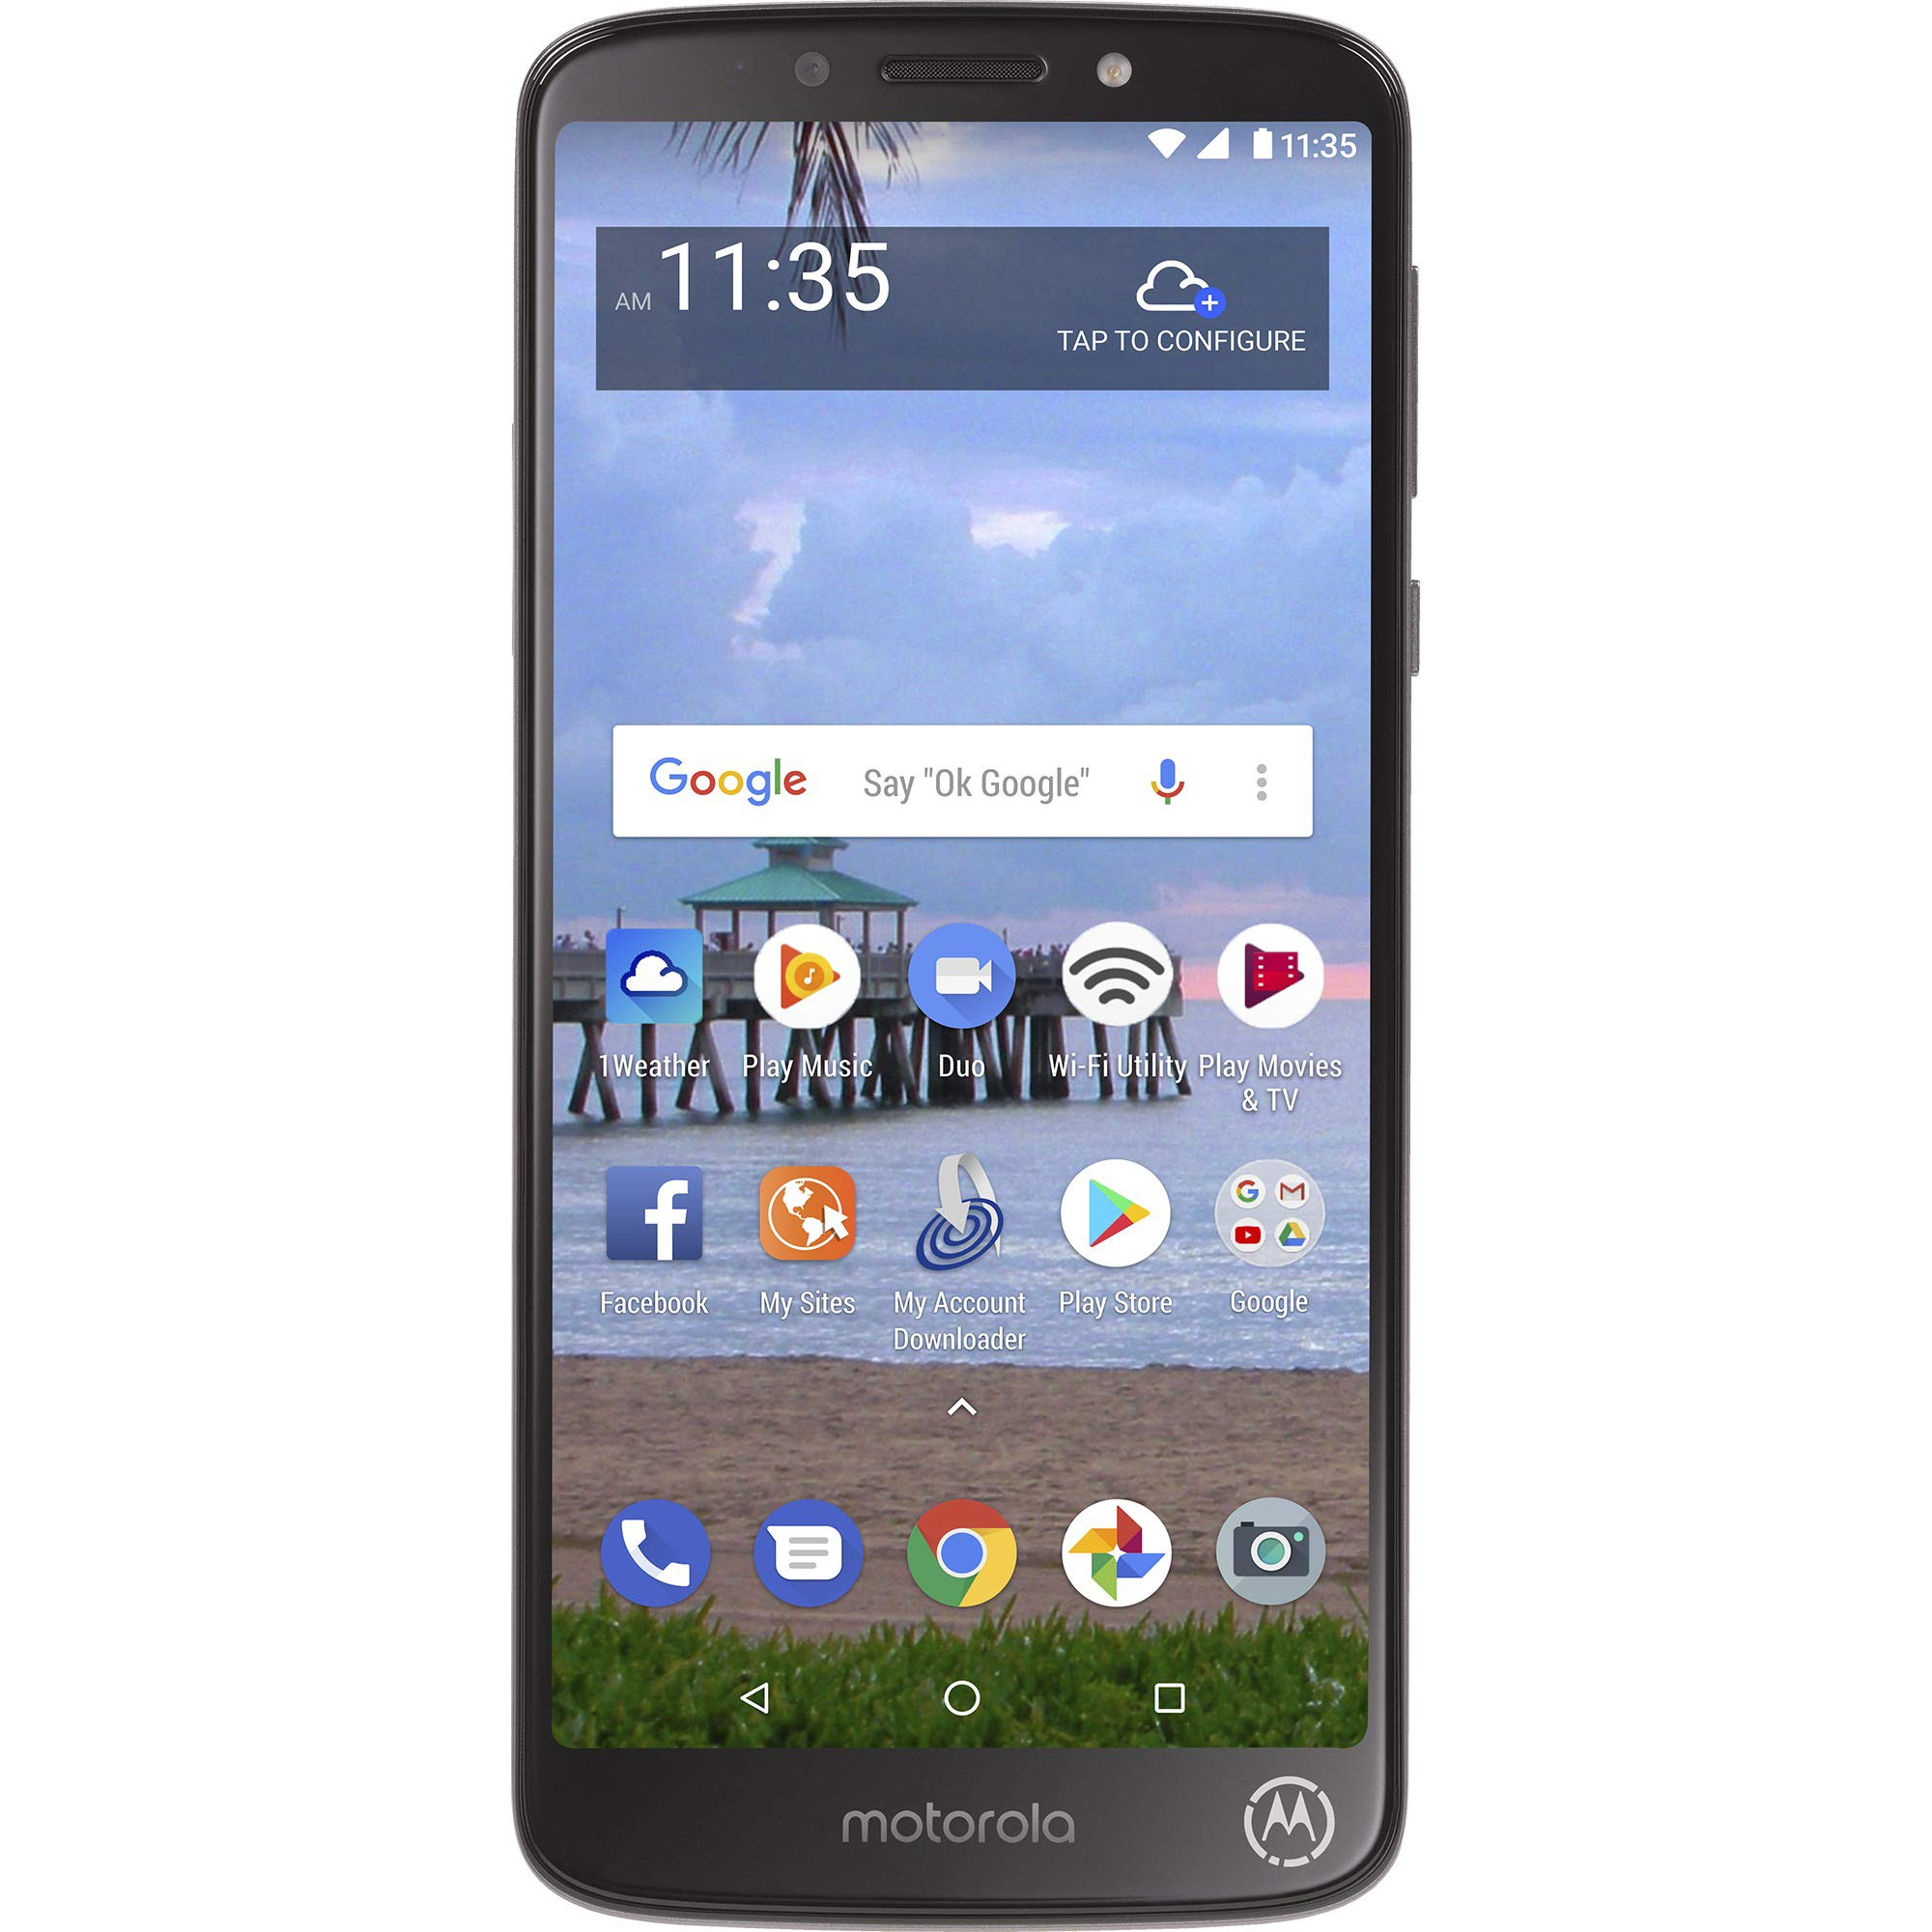 Tracfone Motorola Moto e5 4G LTE Prepaid Smartphone (Locked) – Black – 16GB – Sim Card Included – CDMA